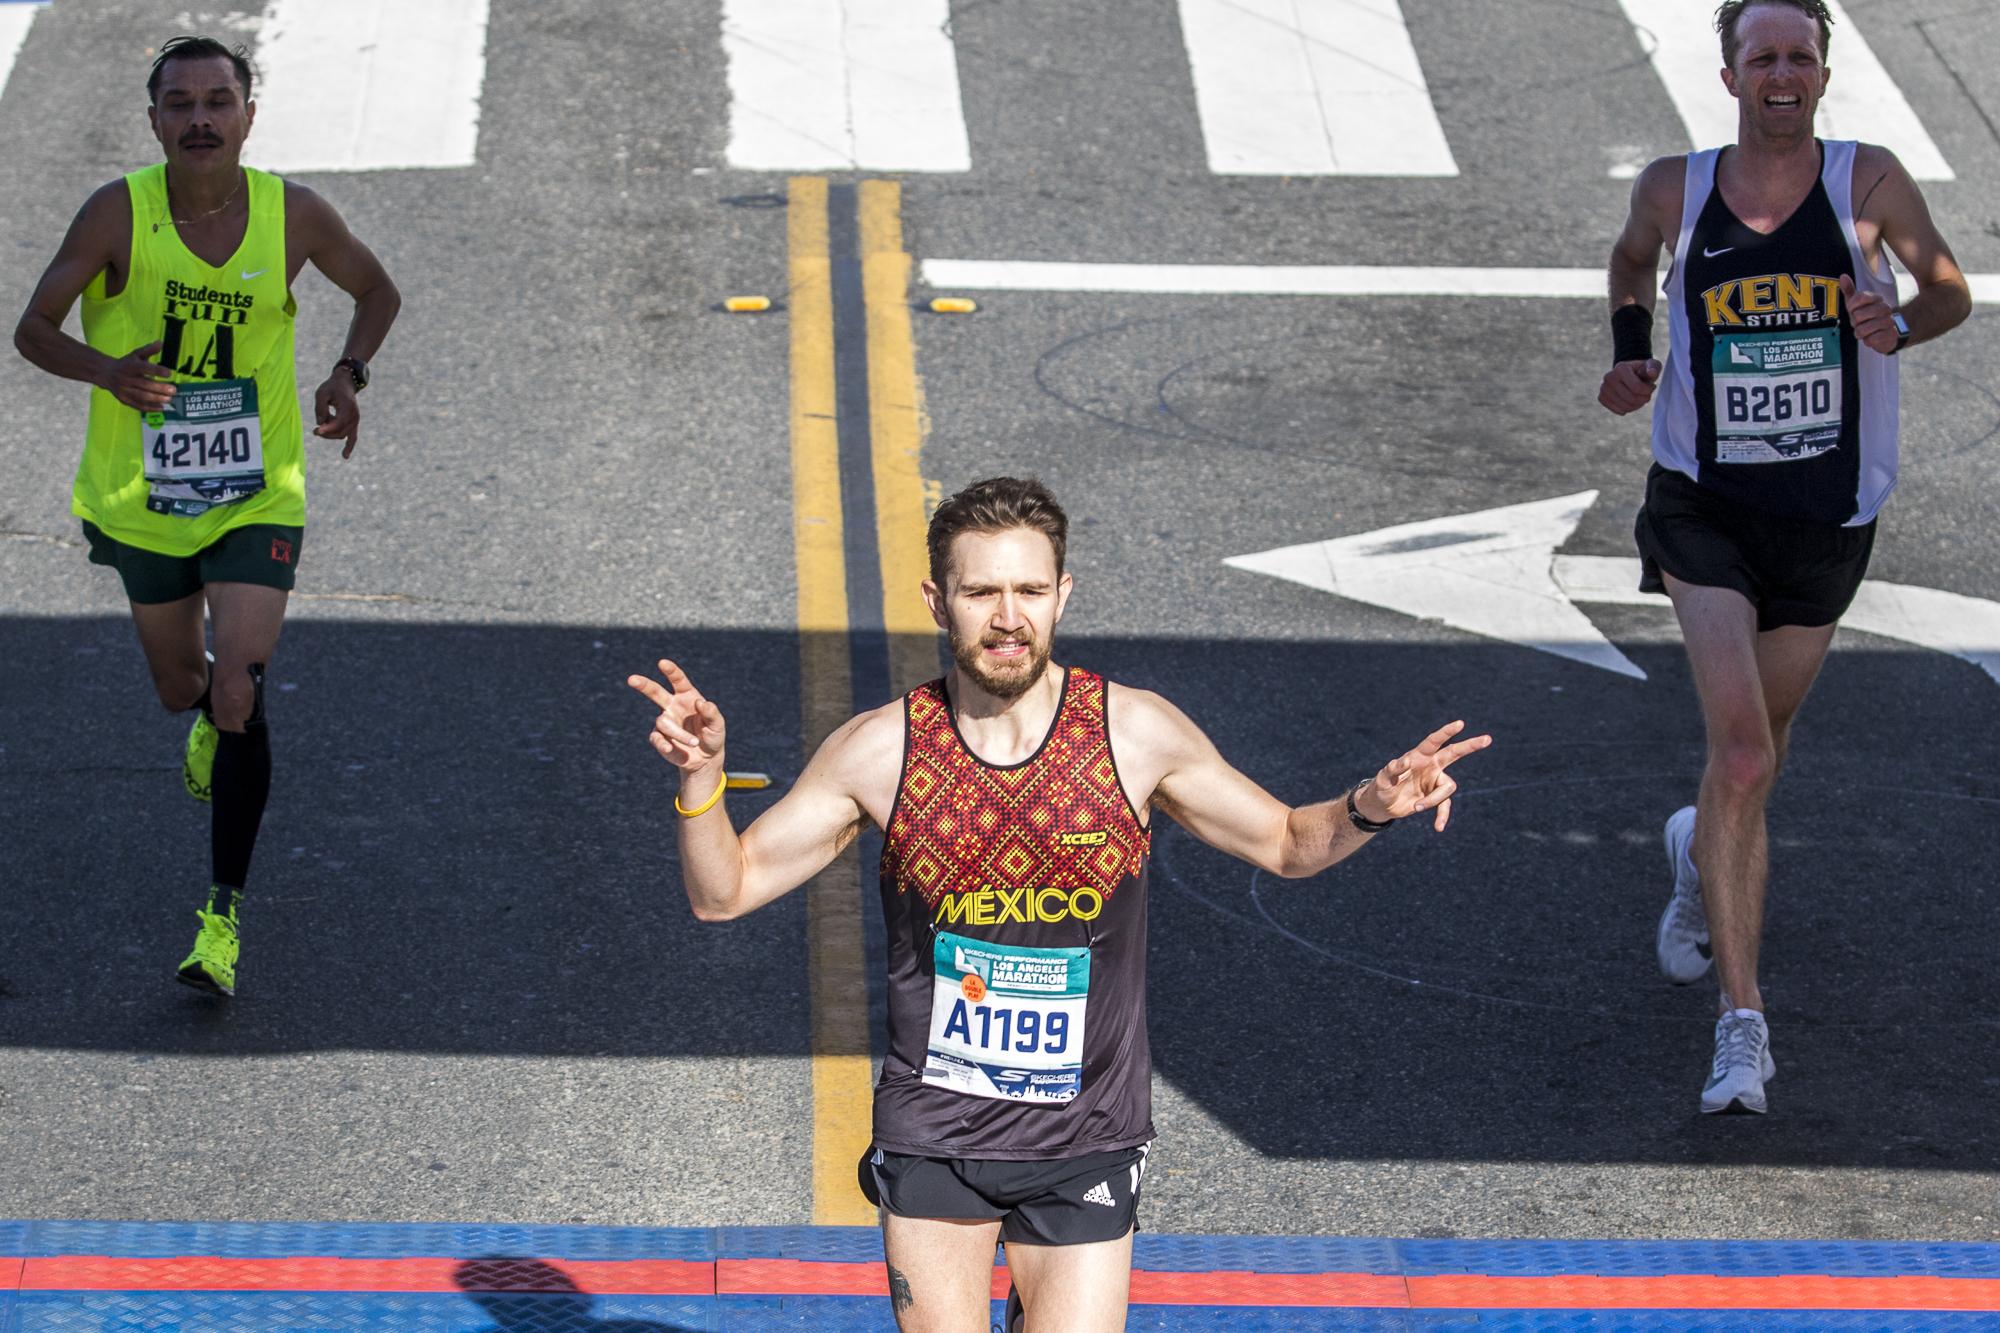 Armando Osorio (middle), Jose Jimenez (left), and Ben Wietmarschen (right) finishing the 2018 Los Angeles Marathon on March 18, 2018 in Santa Monica, California. (Zane Meyer-Thornton/Corsair Photo)